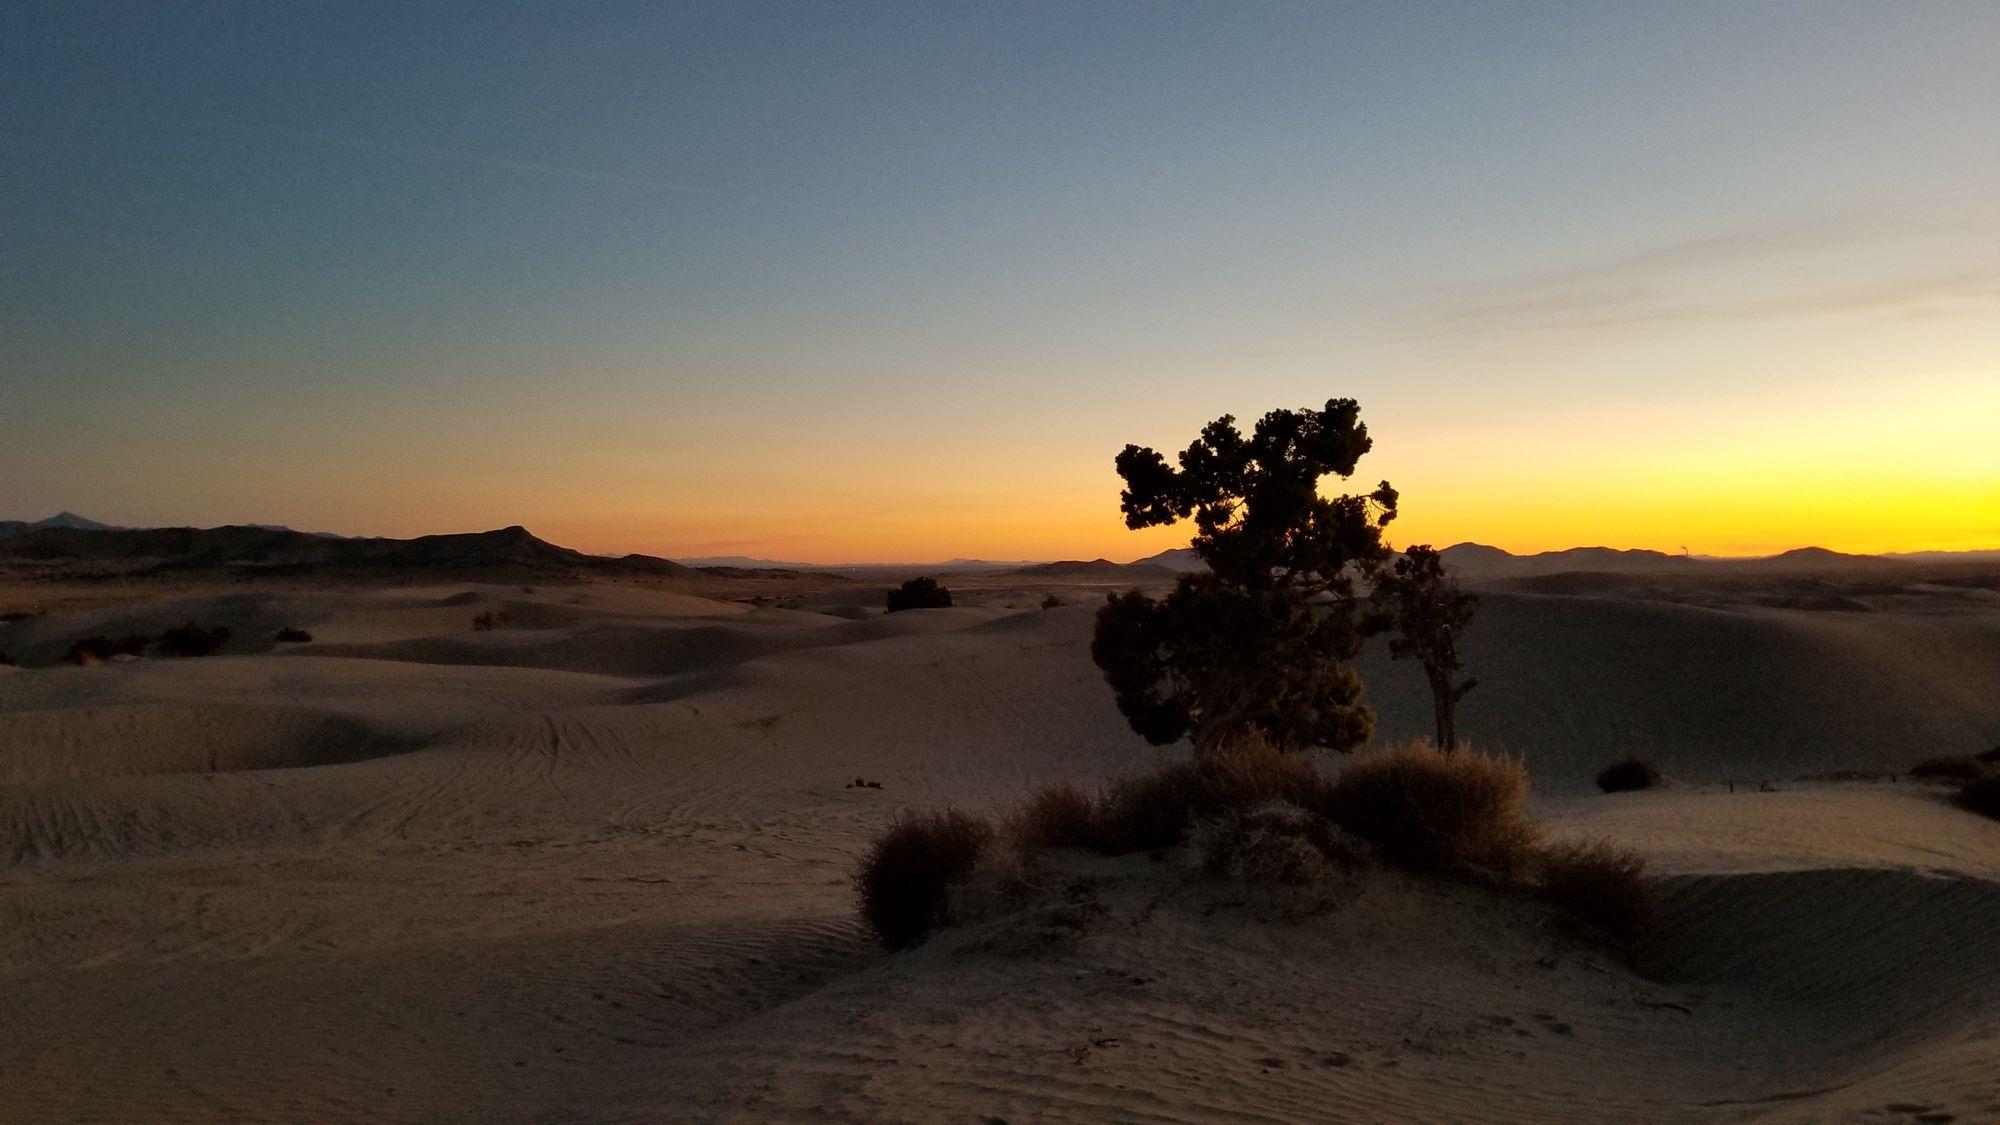 Sunset over Little Sahara